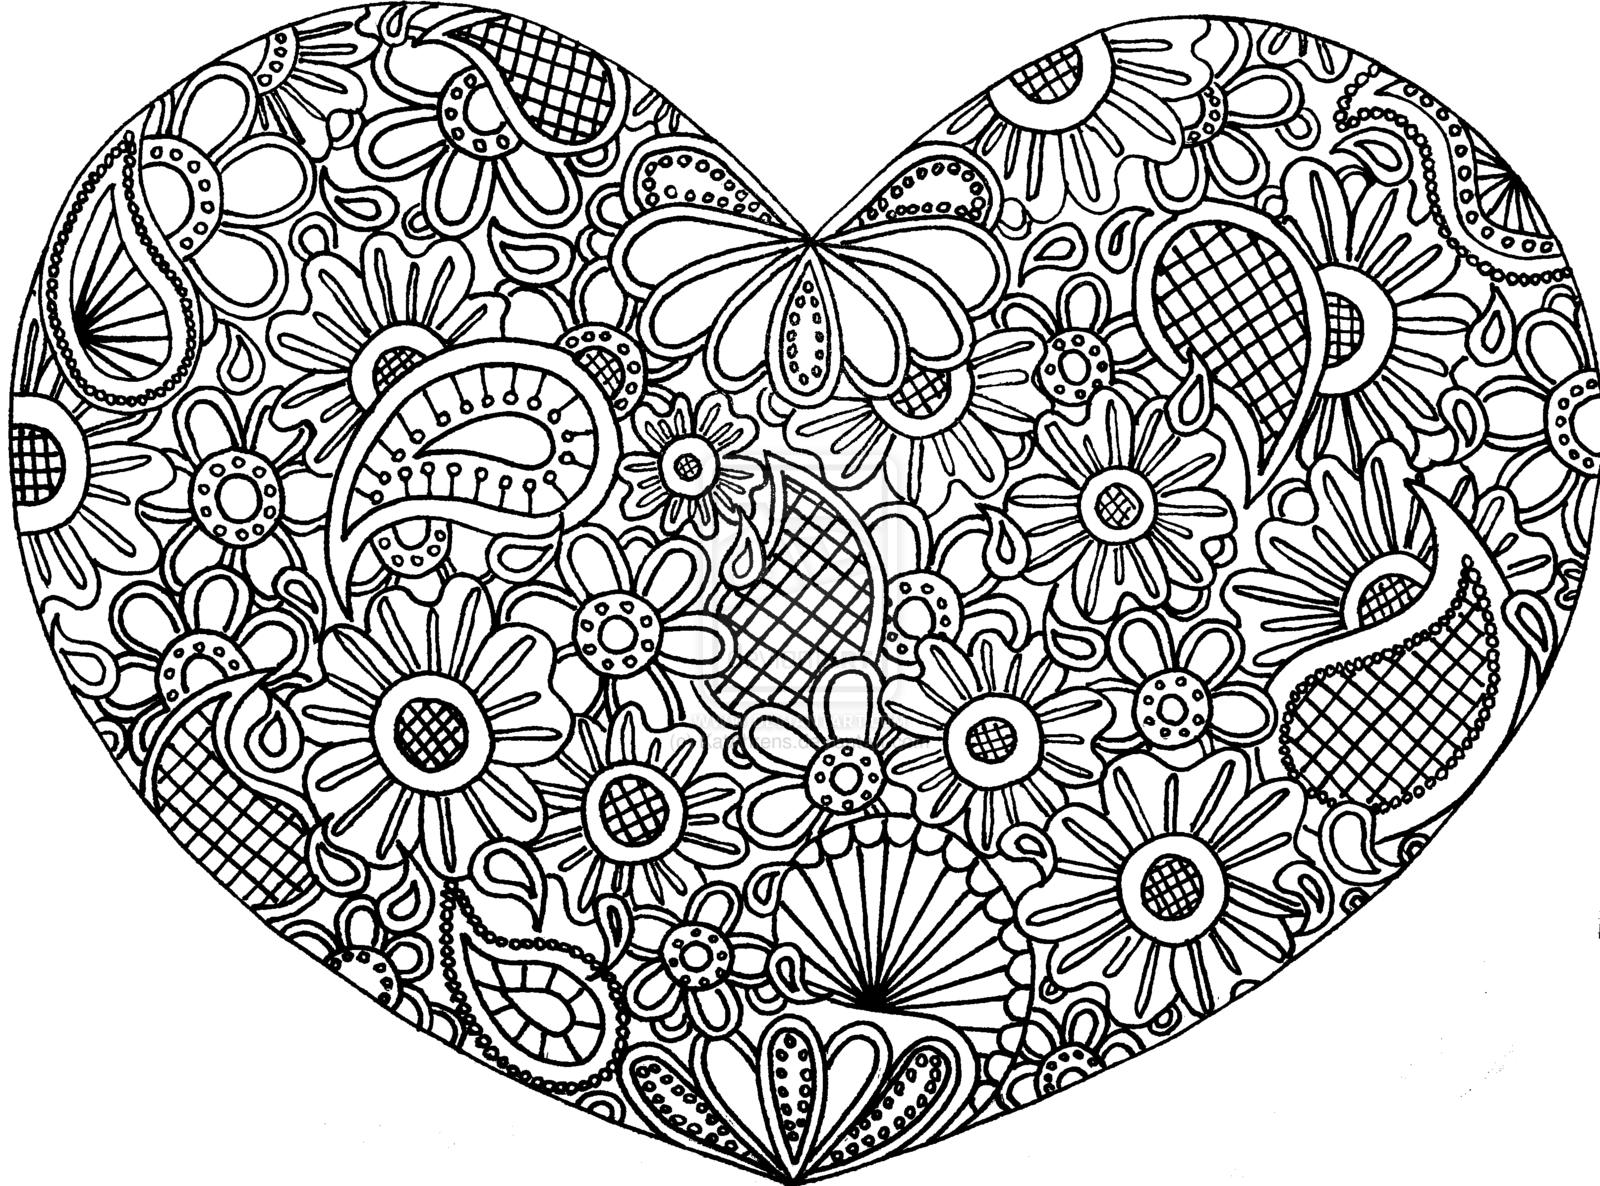 Drawn hearts doodle art #3